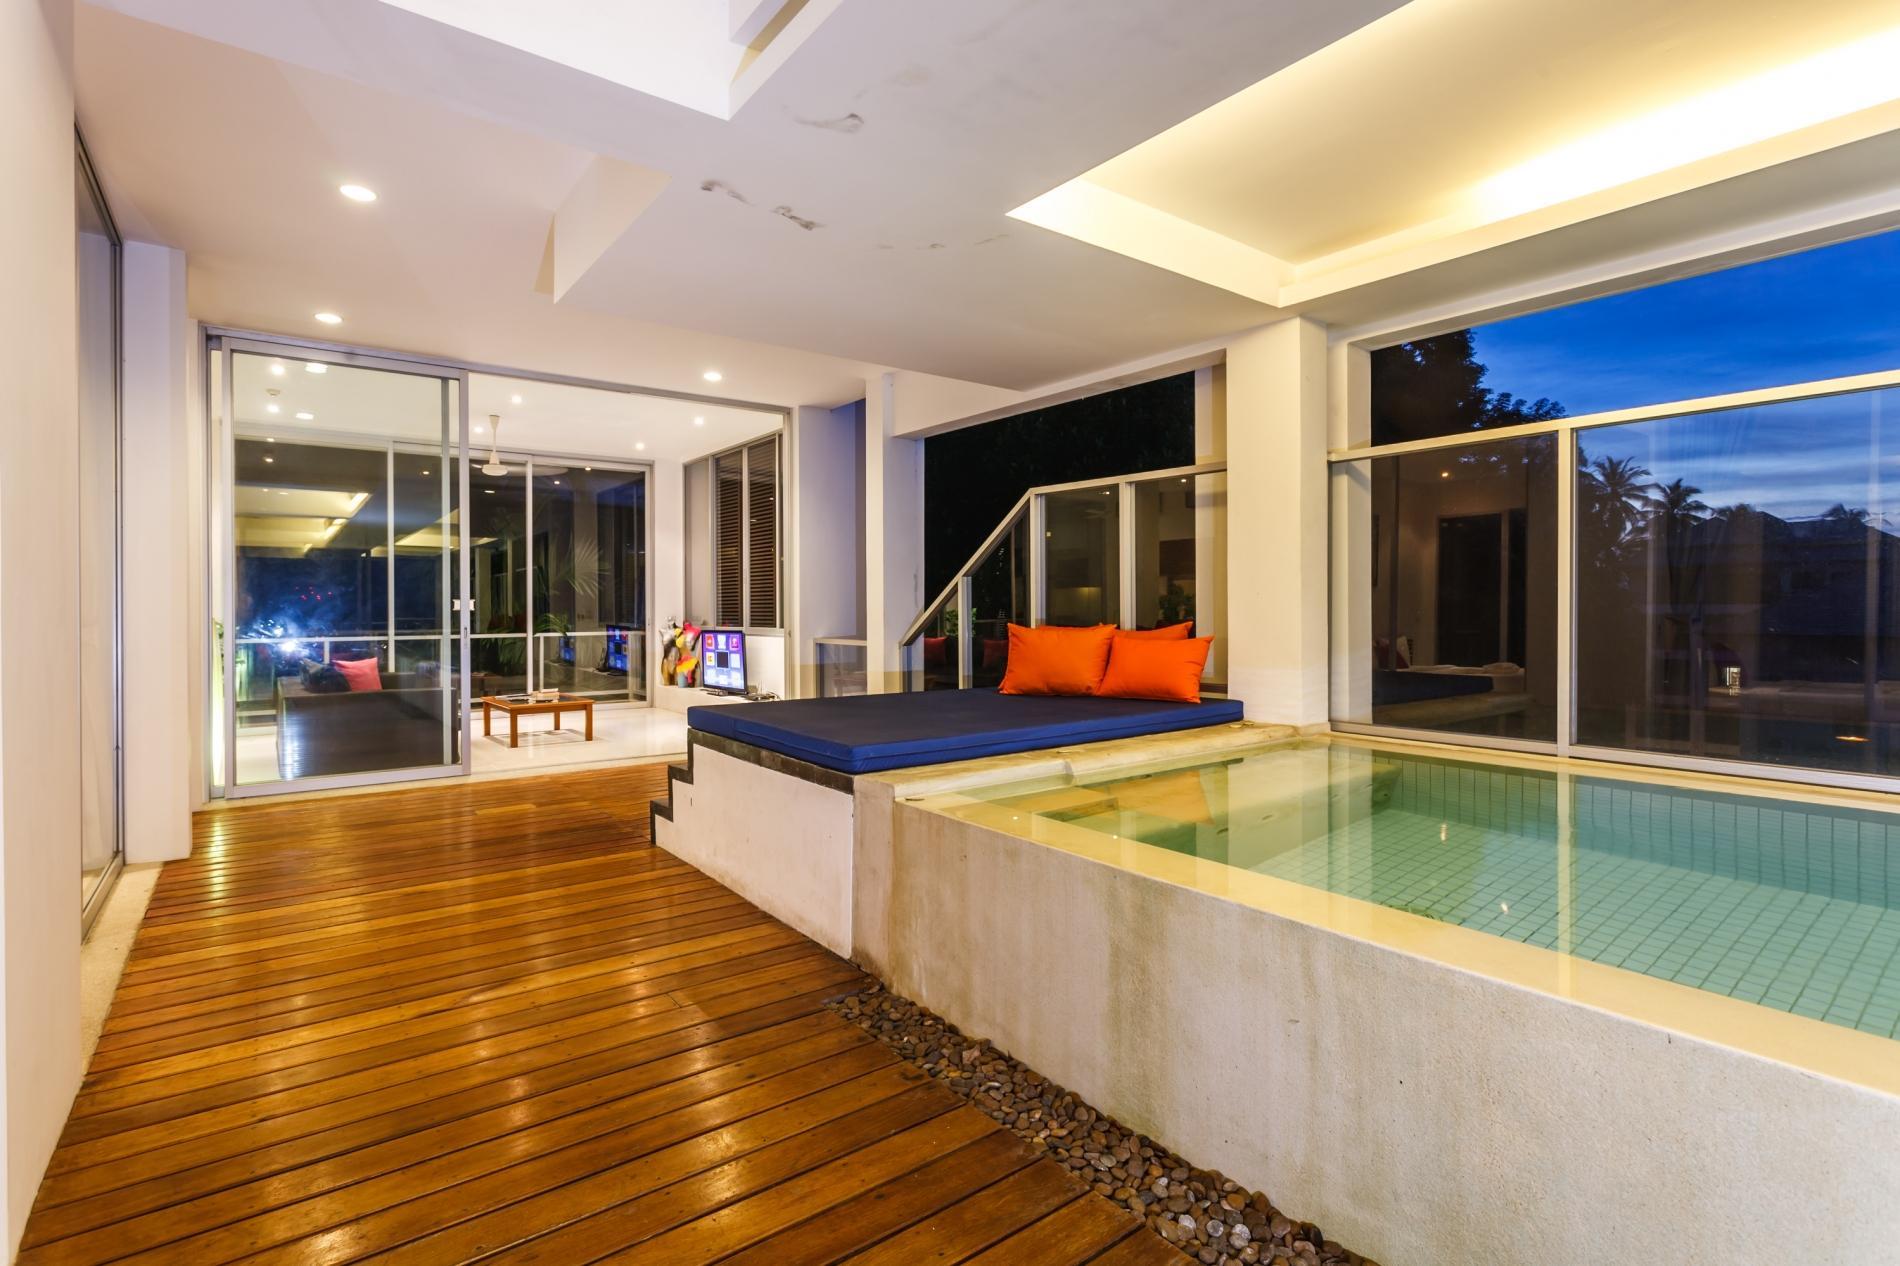 Apartment The Quarter 301 - Luxury Surin 3 bedroom apartment private pool photo 20176510